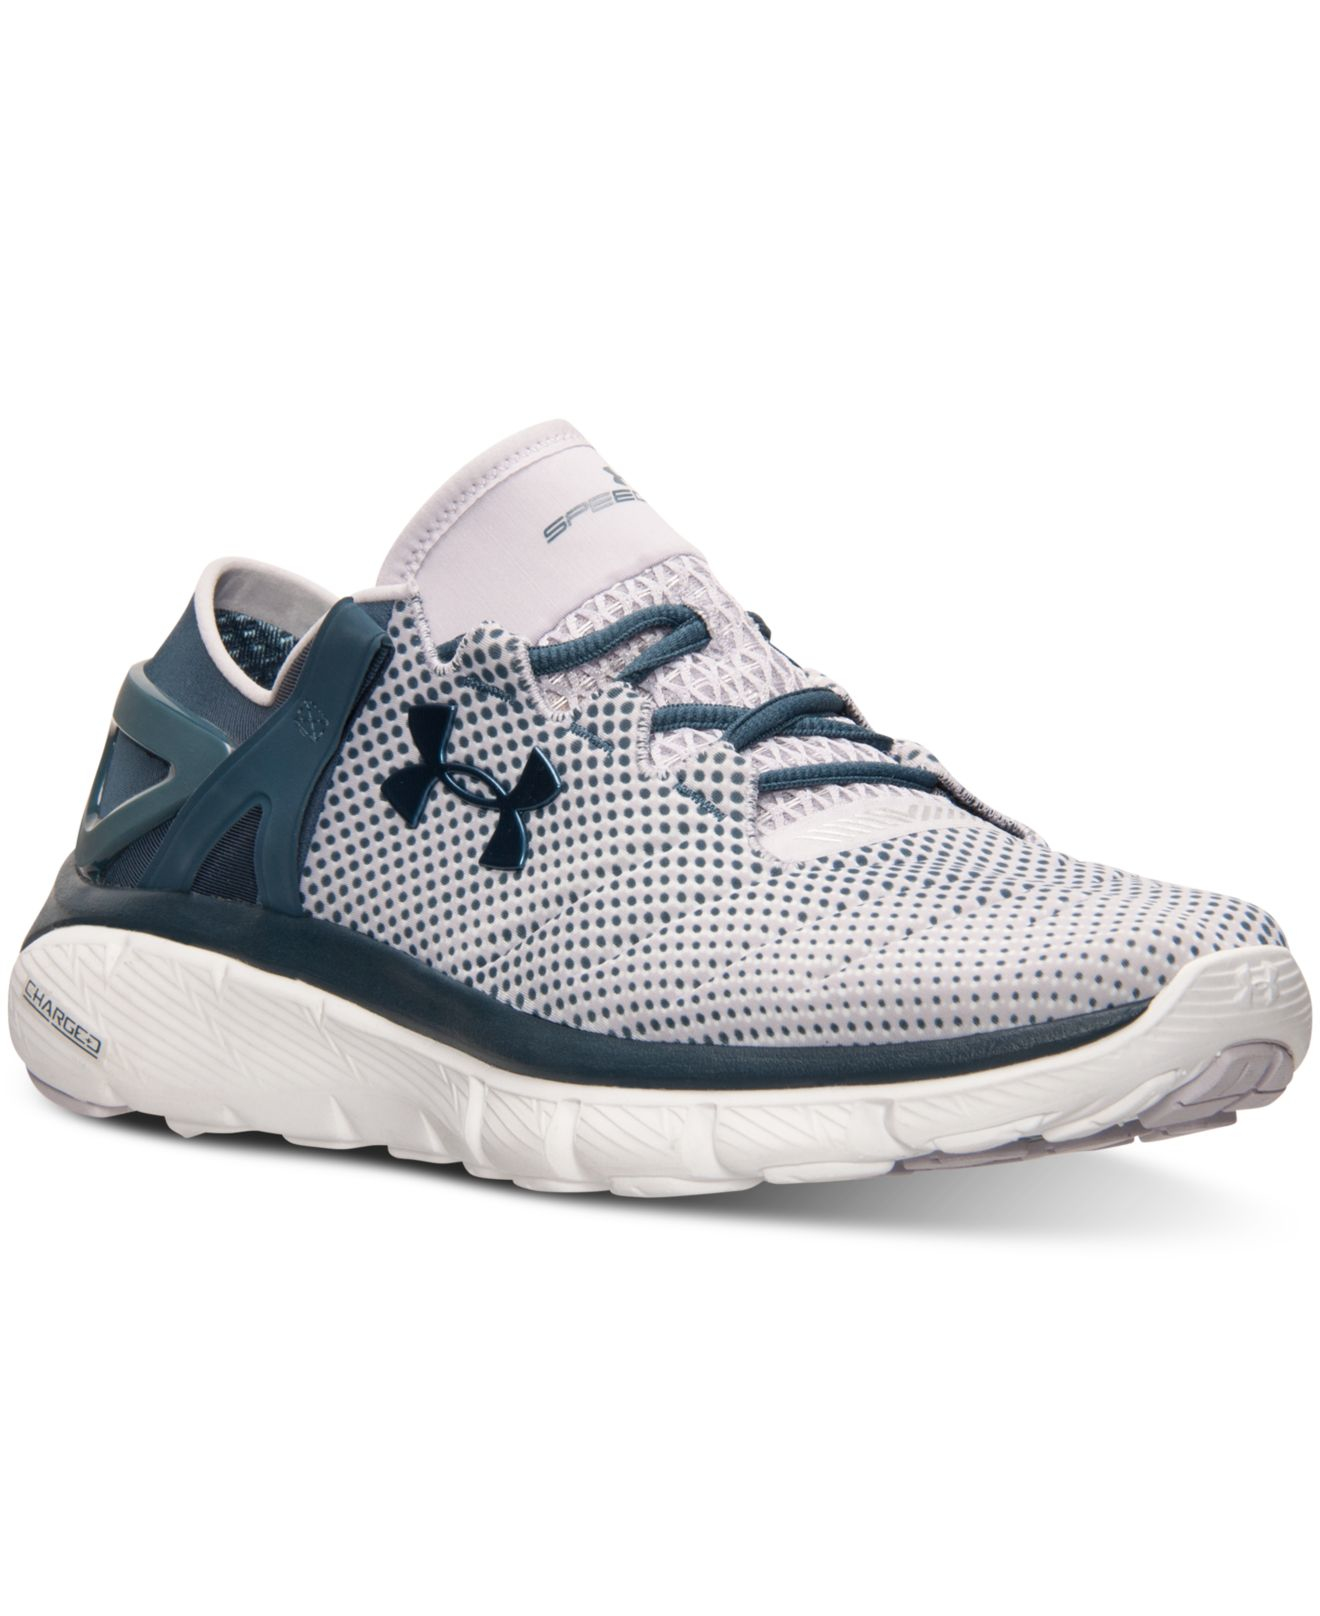 Lyst - Under Armour Women s Speedform Fortis Pixel Running Sneakers ... c4e4fe3a1b